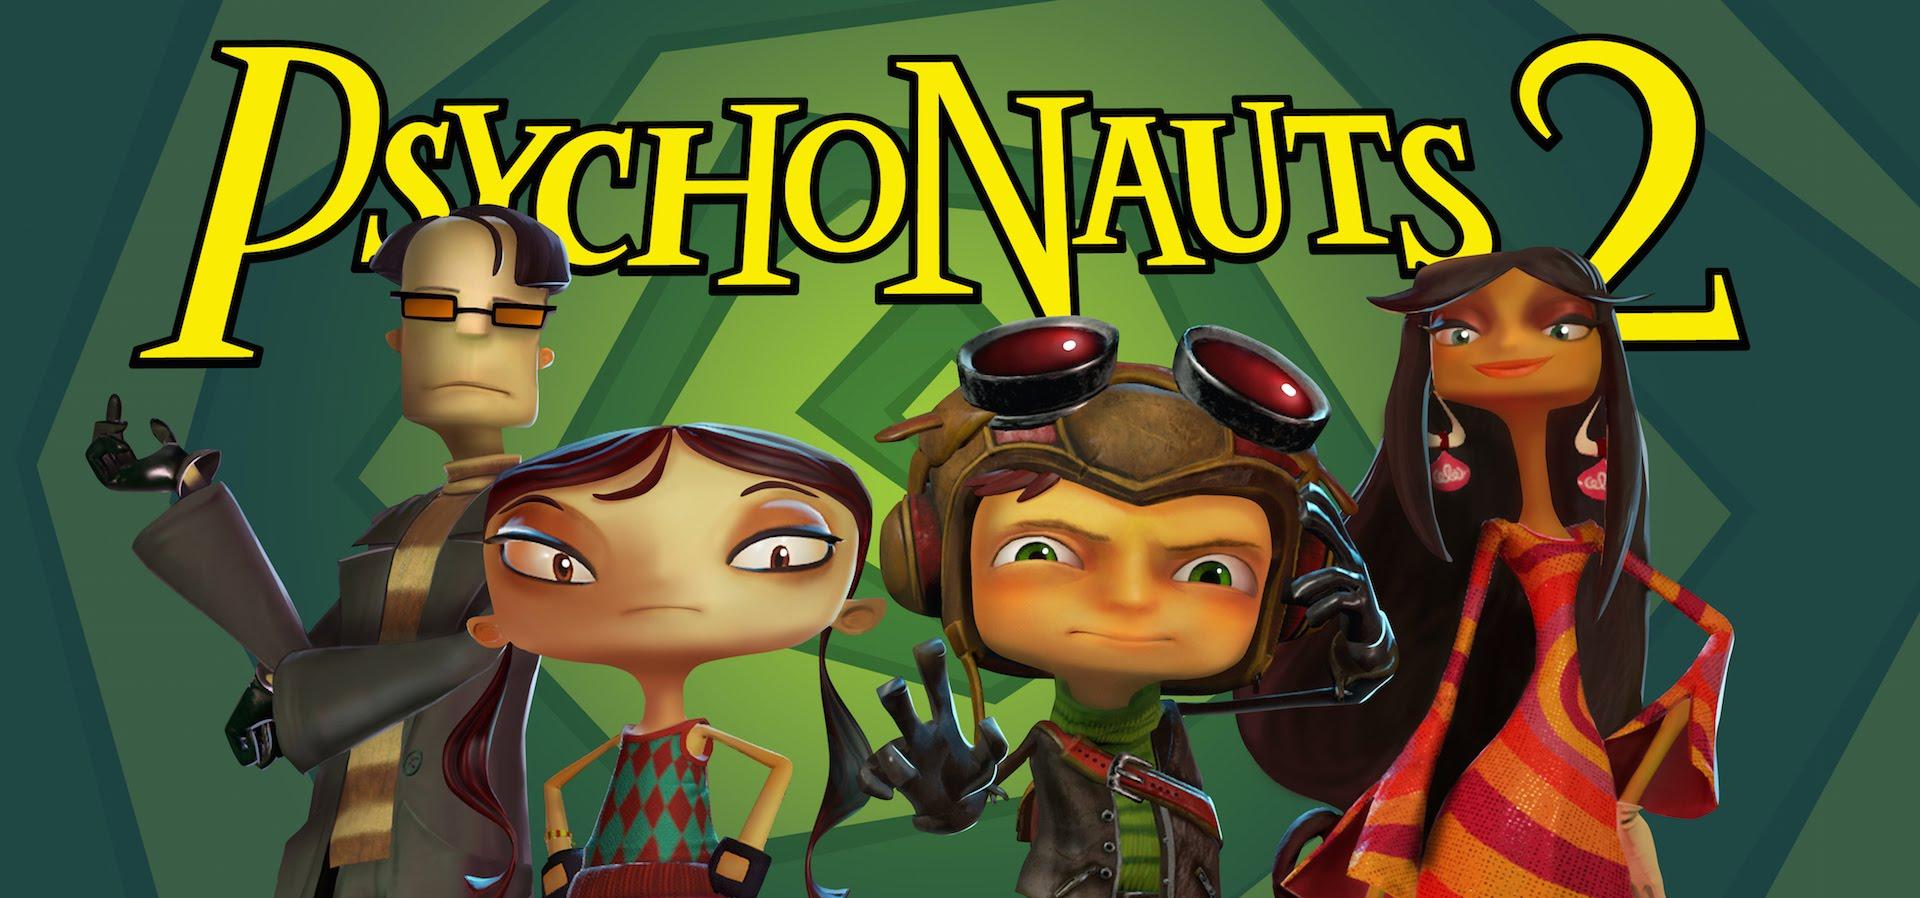 Psychonauts 2 a primit trailer de anunțare și campanie prin FIG